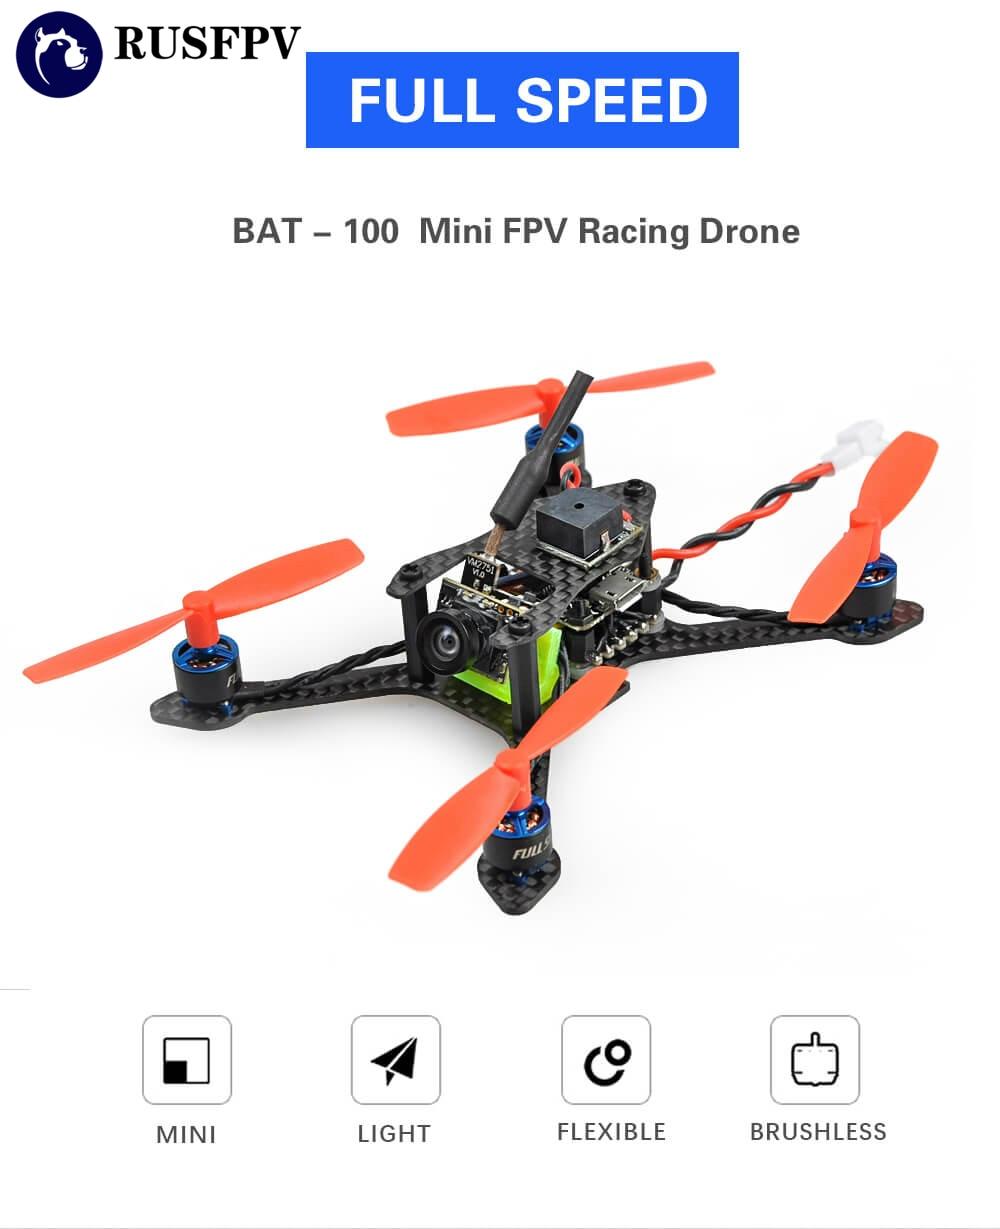 FSD Bat-100 100mm F3 6A BLHELI_S Dshot600 25MW 48CH 600TVL VTX 1s 550mah 50C HV Mini FPV Racing Drone PNPFSD Bat-100 100mm F3 6A BLHELI_S Dshot600 25MW 48CH 600TVL VTX 1s 550mah 50C HV Mini FPV Racing Drone PNP